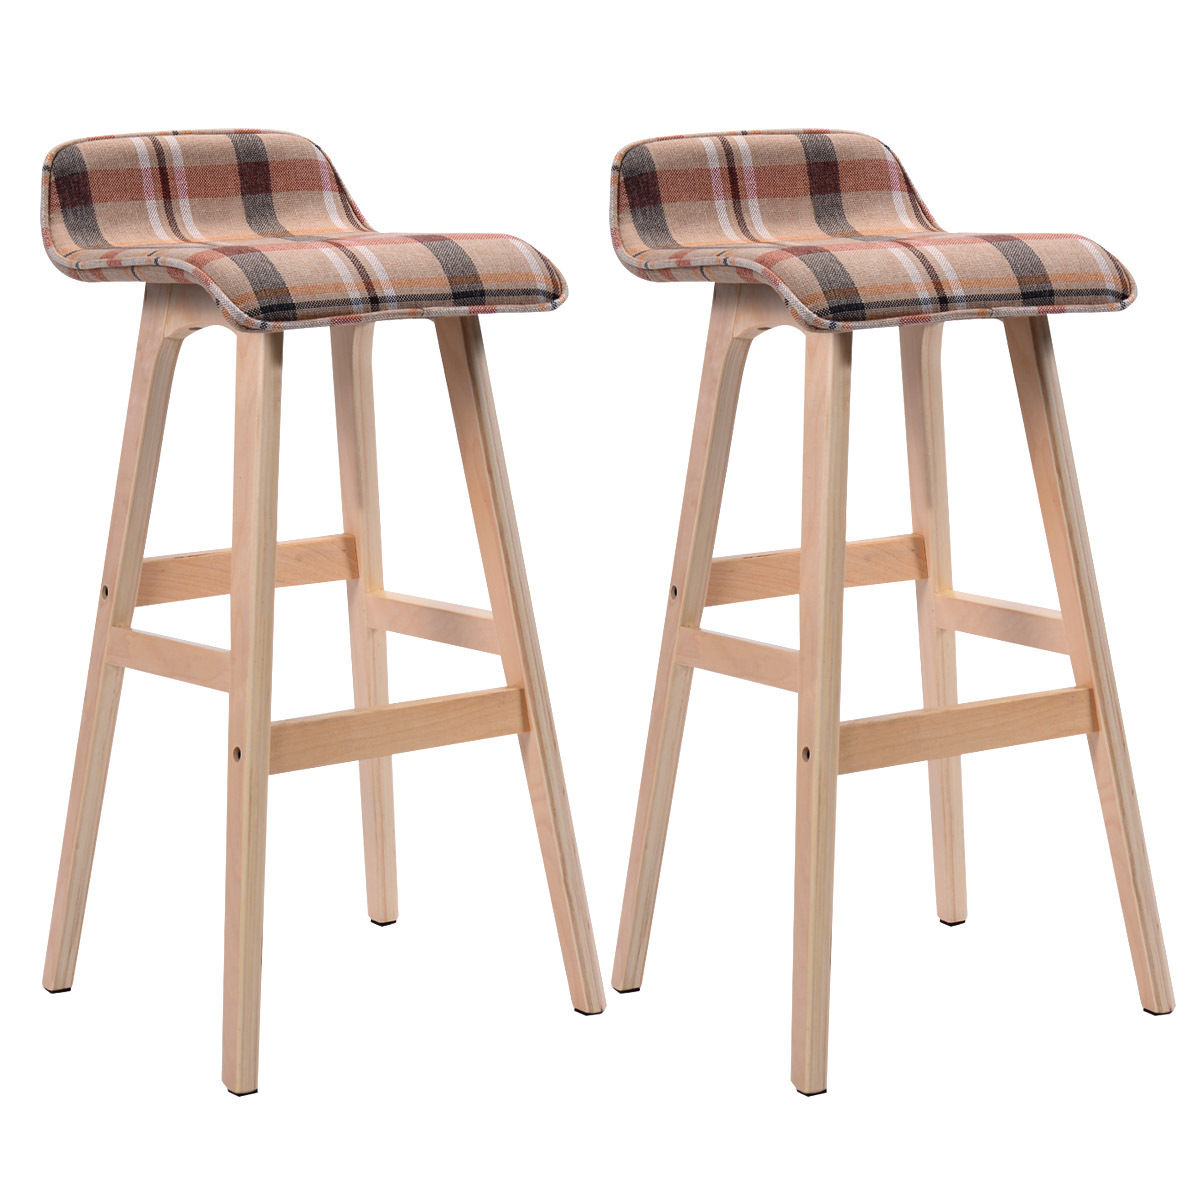 Giantex Set Of 2 29-Inch Vintage Wood Bar Stool Modern Dining Chair Counter Tall Linen Fabric Kitchen Bar Furniture 2*HW52976RE